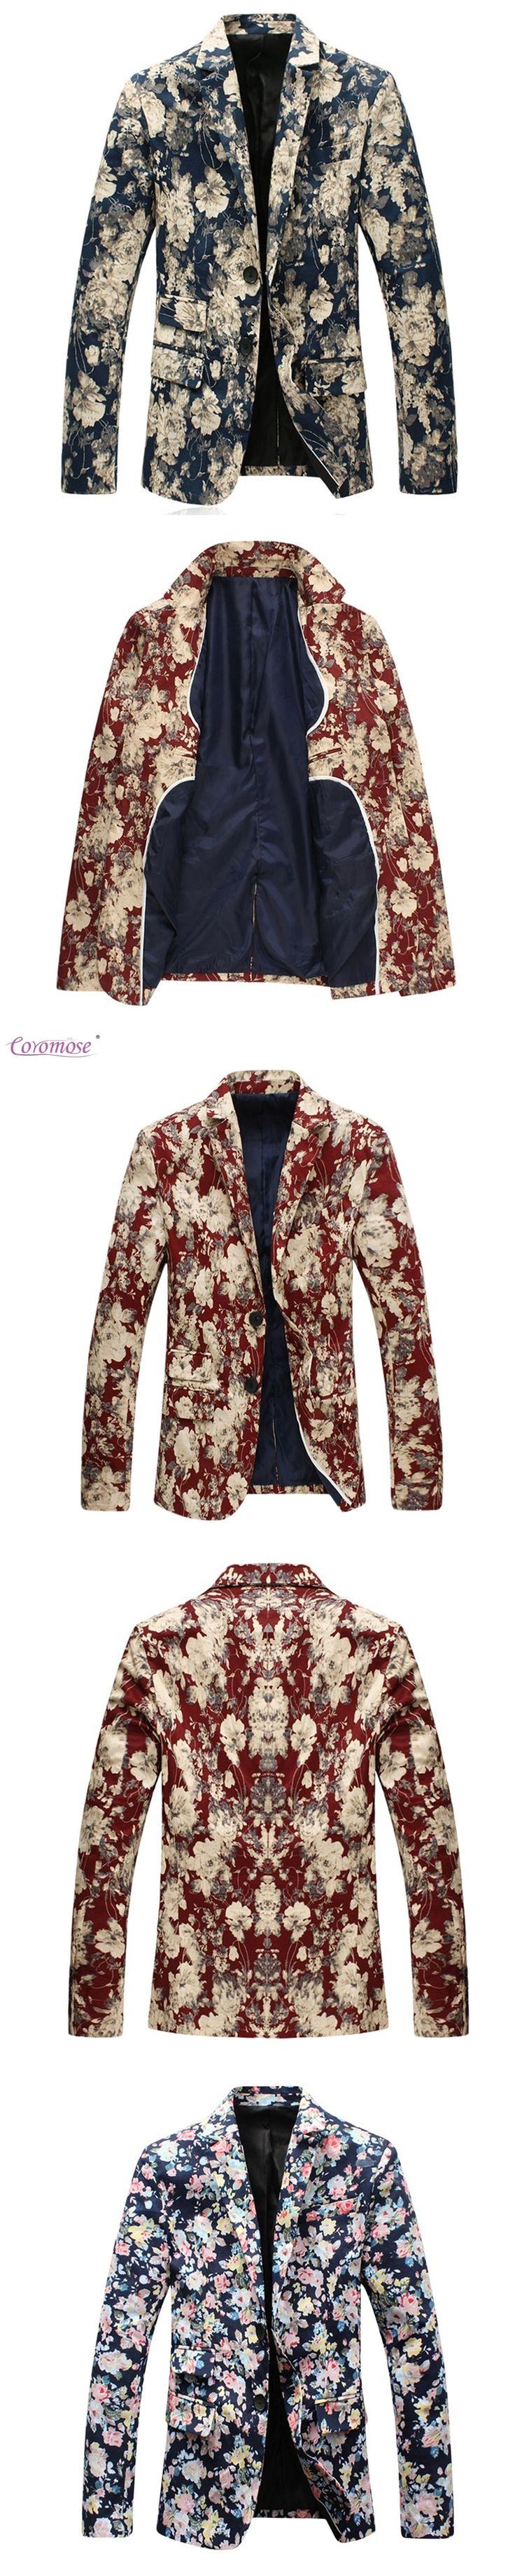 Coromose Men Paisley Floral Pattern Wedding Suit Jacket Slim Fit Stylish Costumes Stage Wear For Singer Mens Blazers Designs